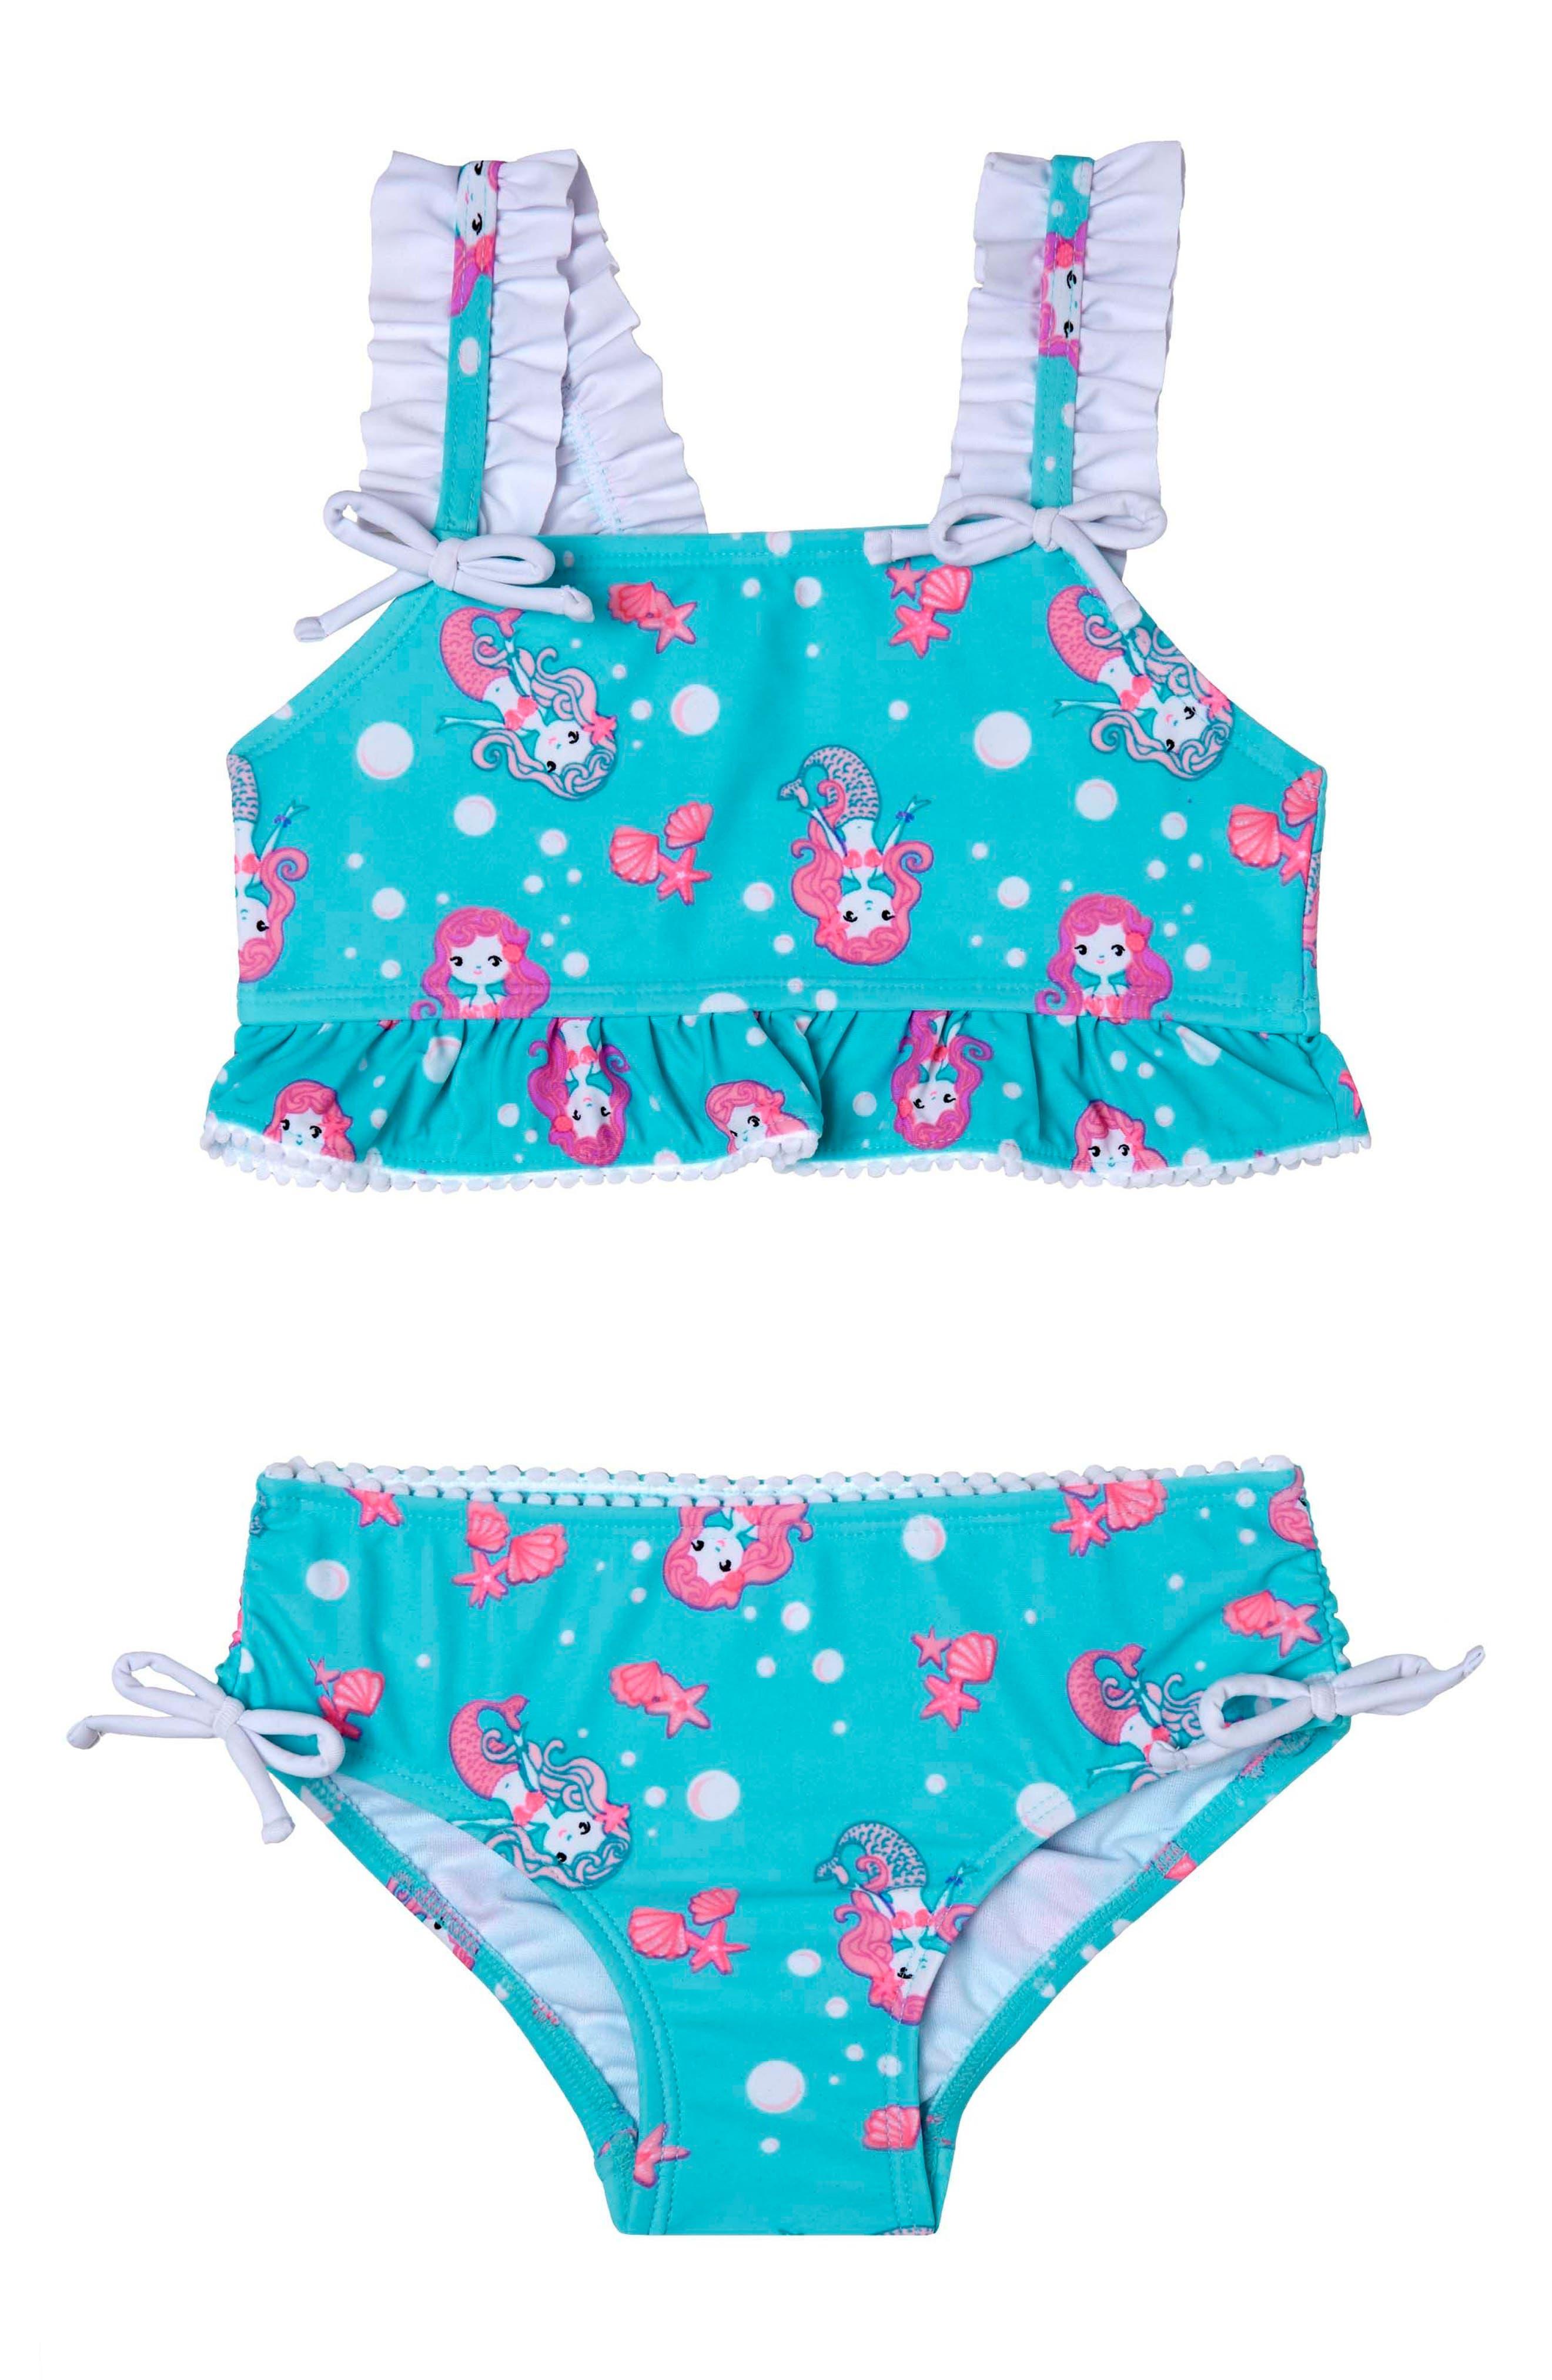 Main Image - Hula Star Mermaid Crush Two-Piece Swimsuit (Toddler Girls & Little Girls)